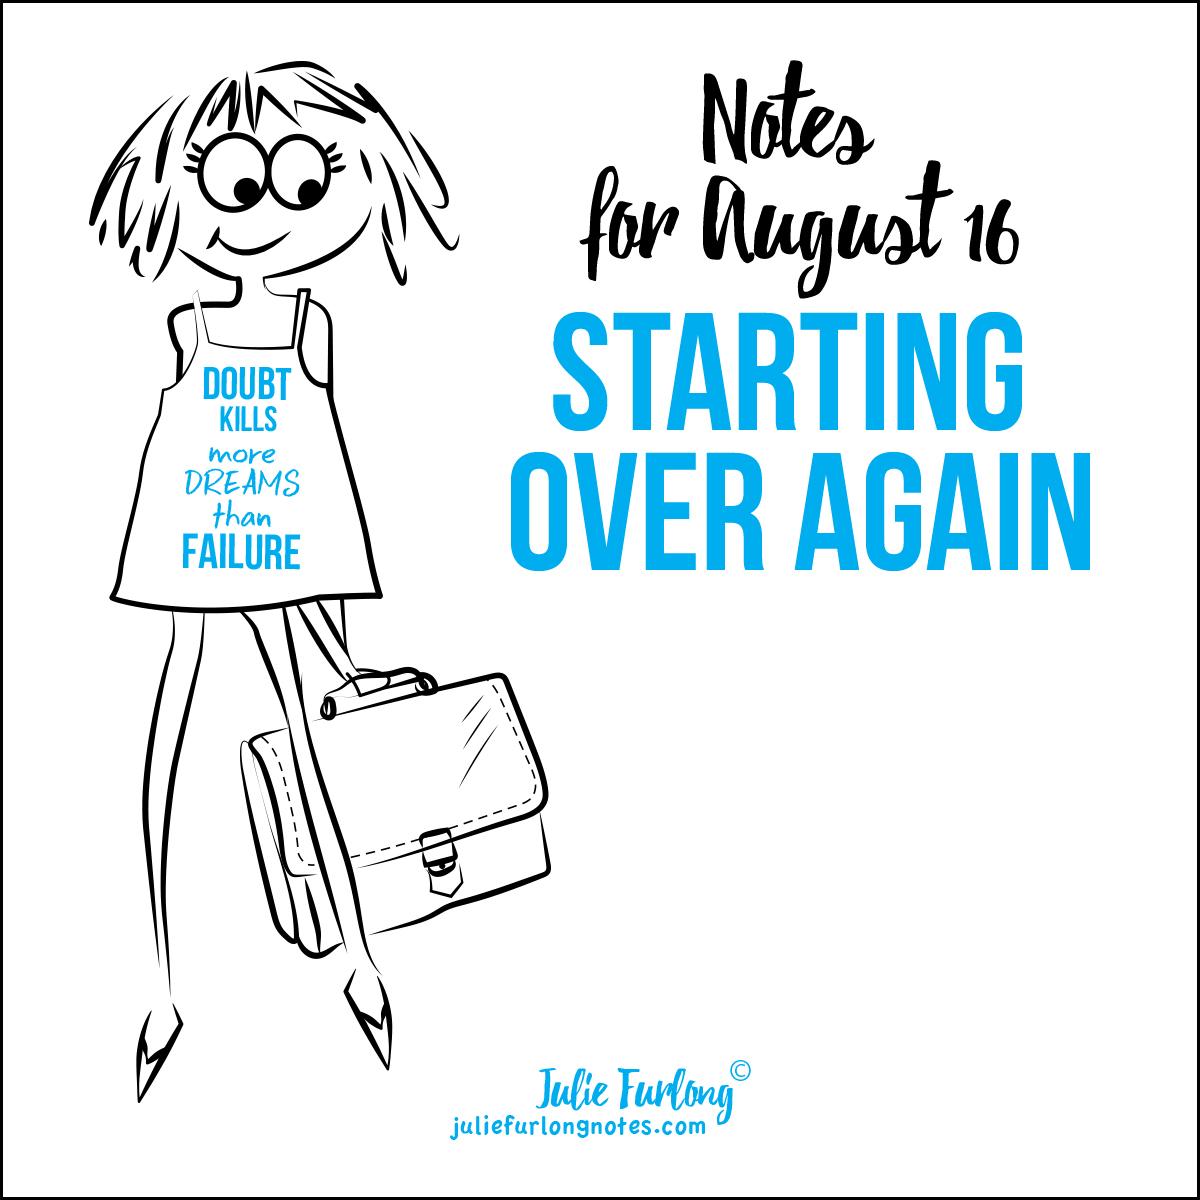 Julie-Furlong-Notes-Starting-Over-Again